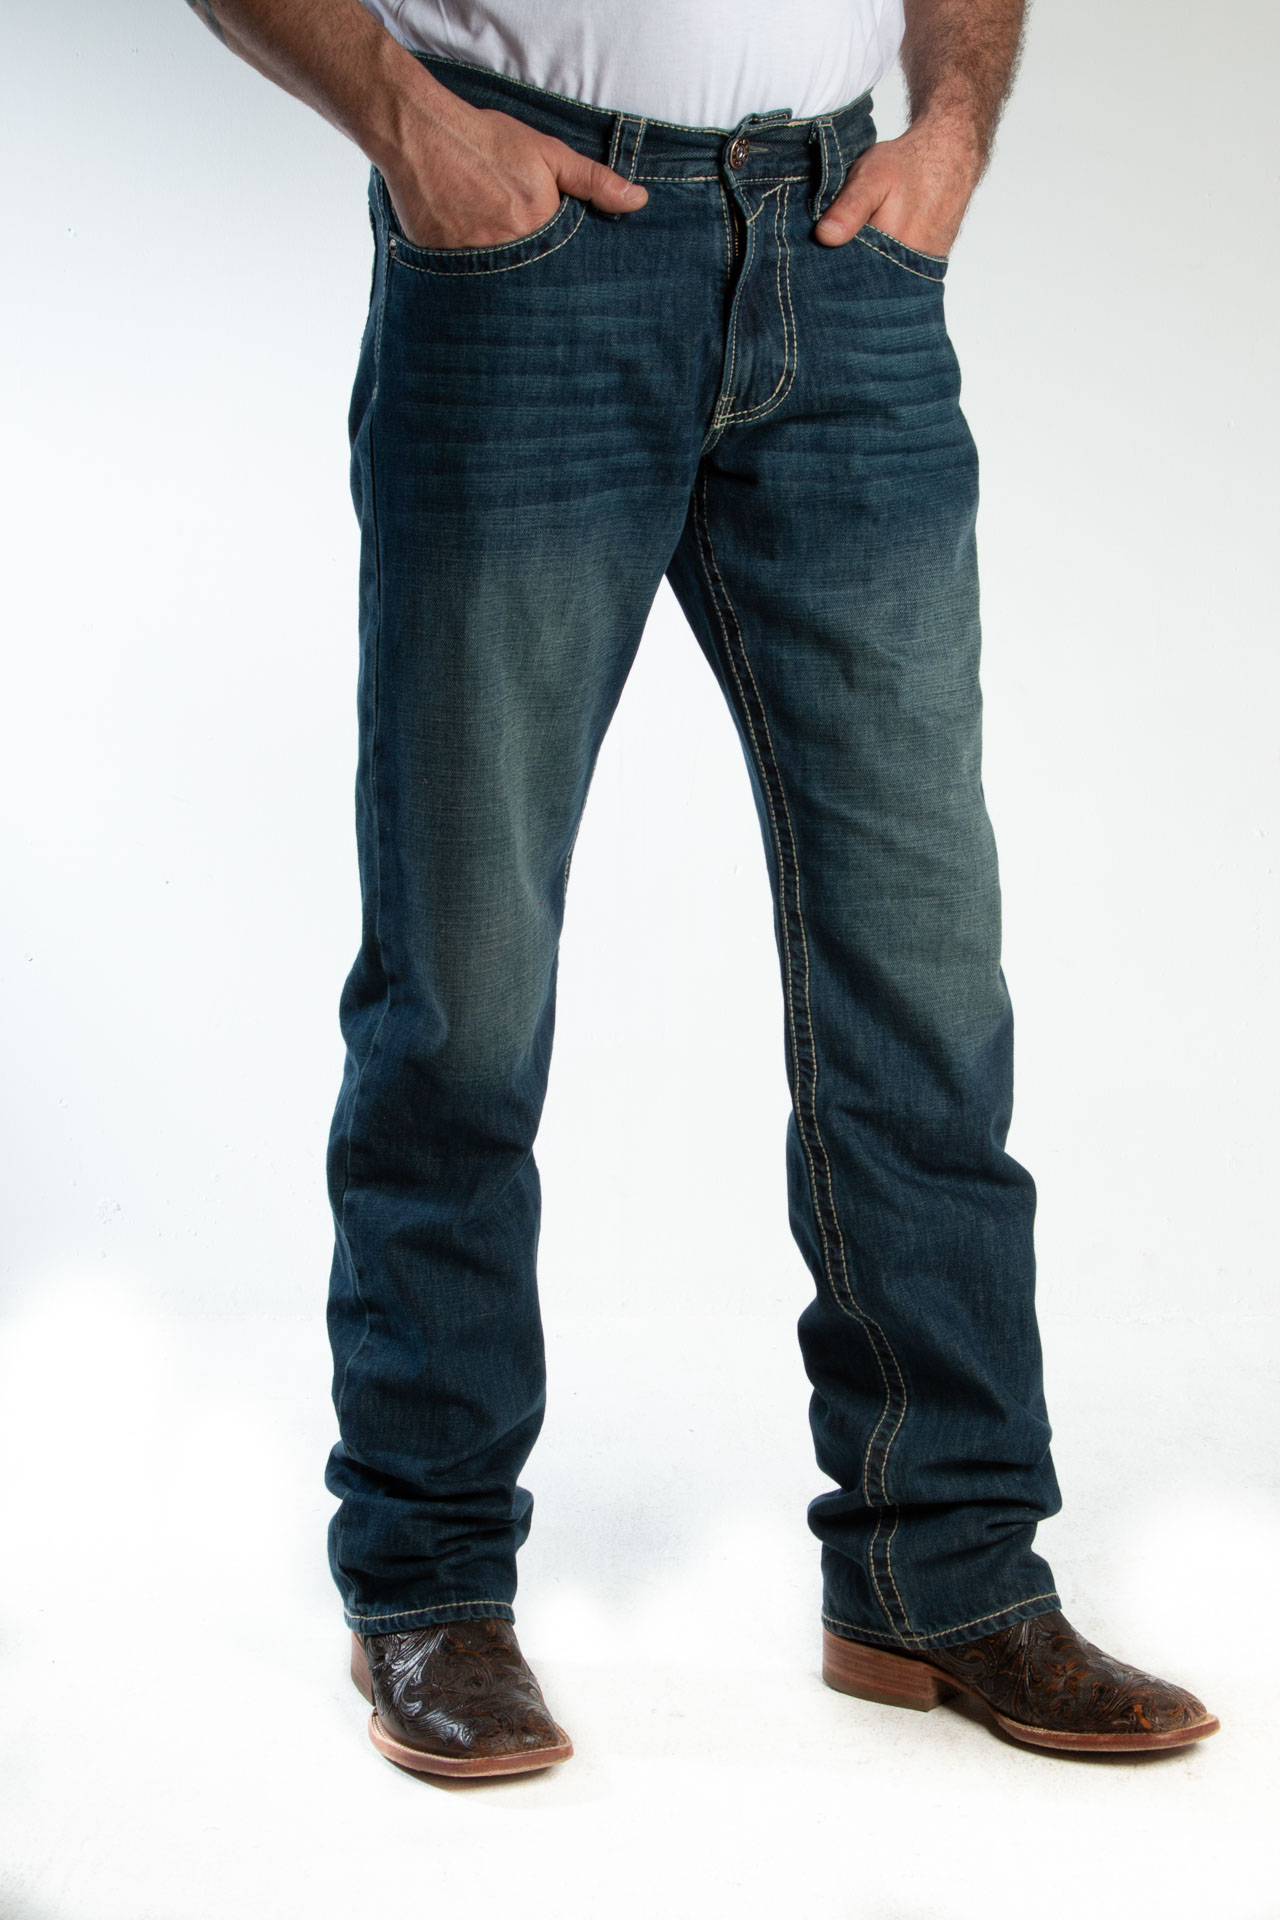 Calça Jeans TXC Masculina X3 DARK